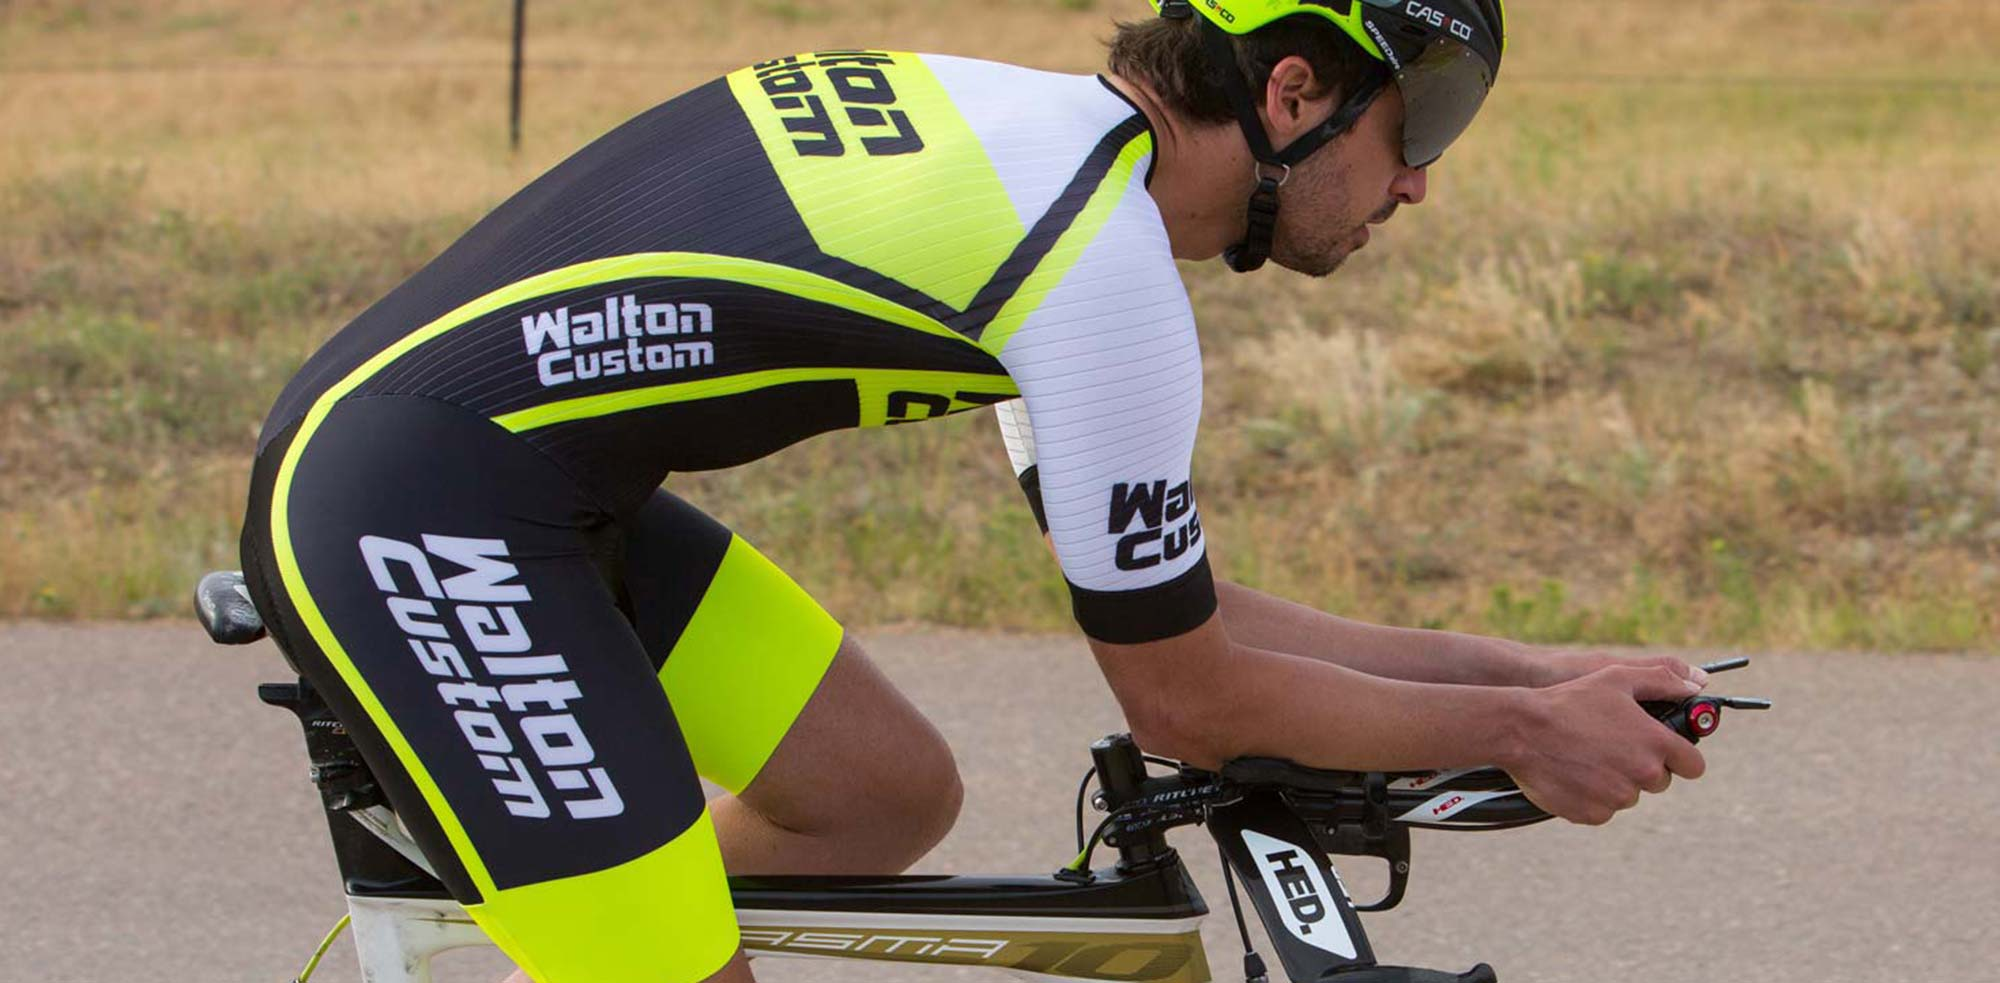 slide-walton-skinsuit1-revised2